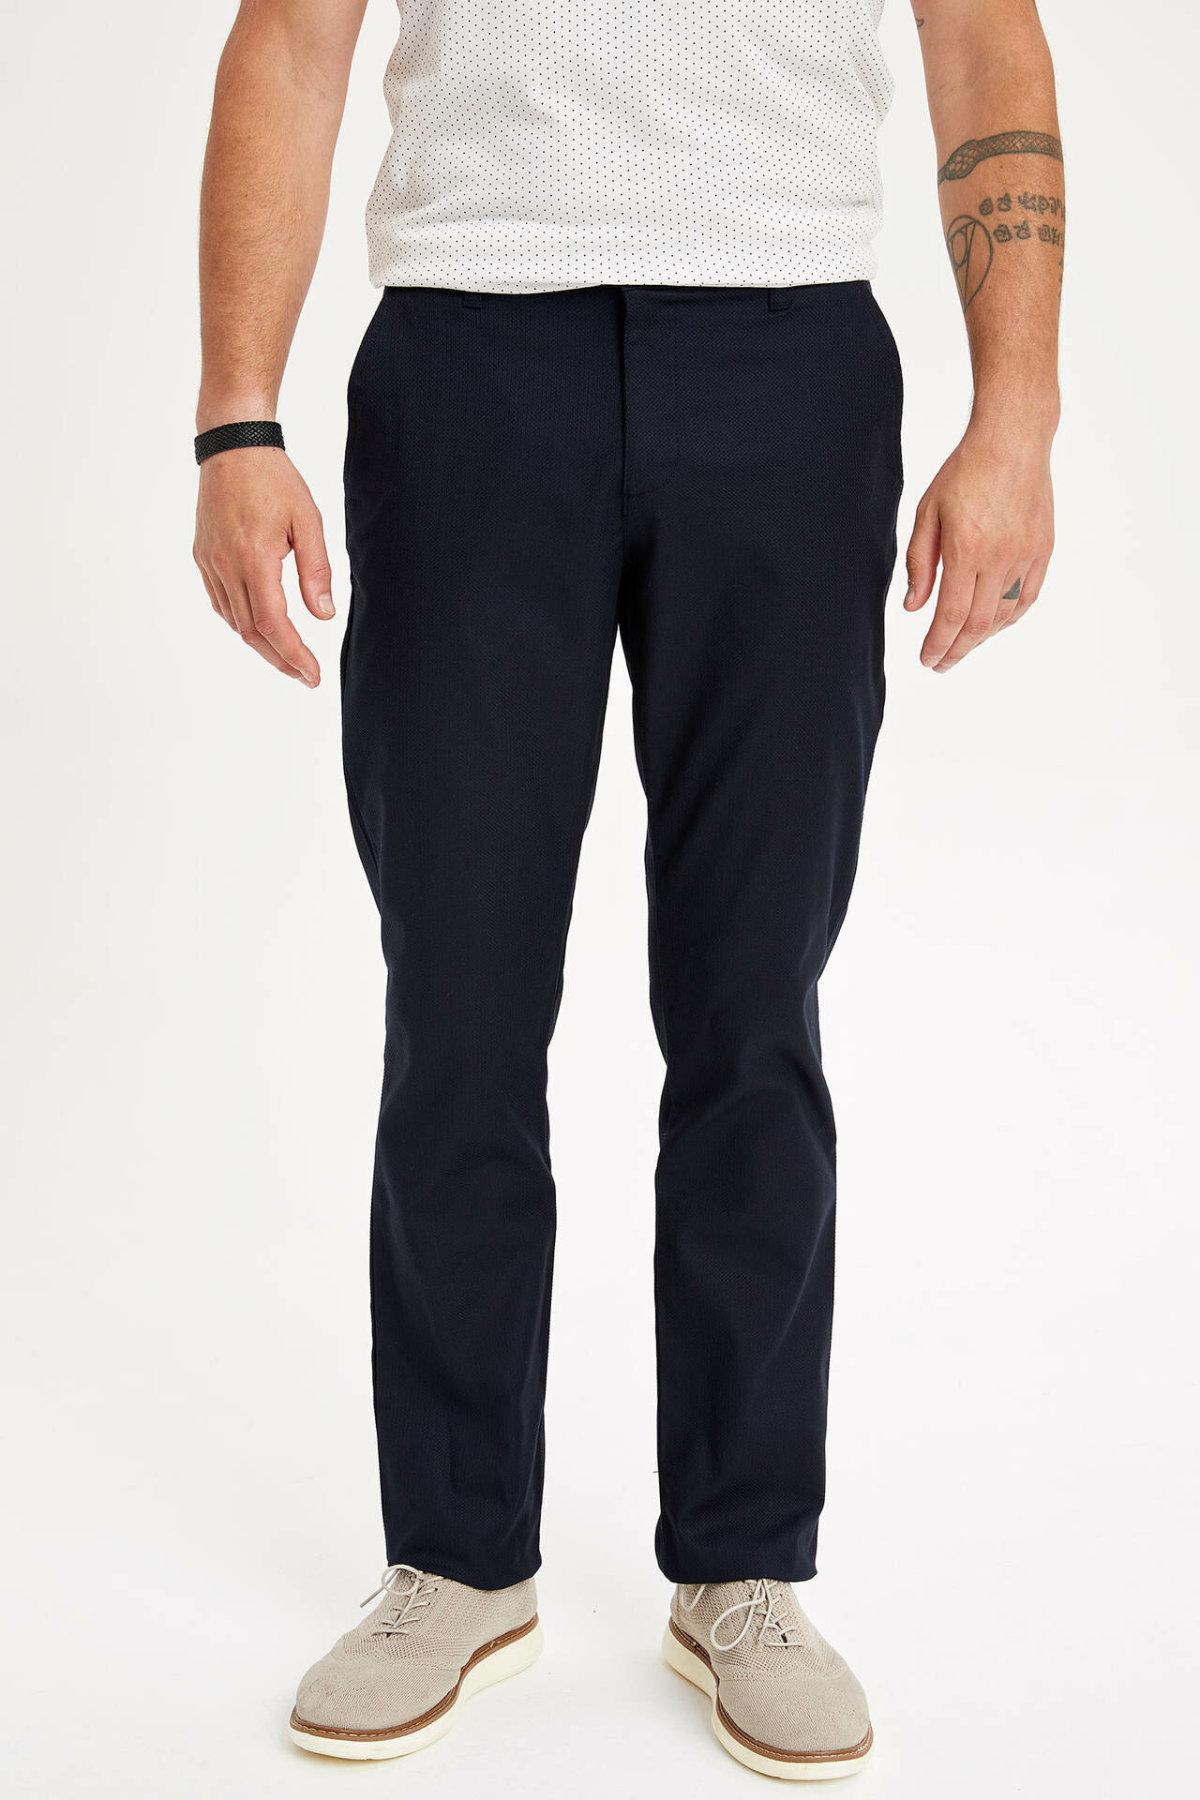 DeFacto Men's Solid Loose Casual Trousers Male Classic Style Straight Pant Cotton High Quality Fashion Pants Men - L3730AZ19SM